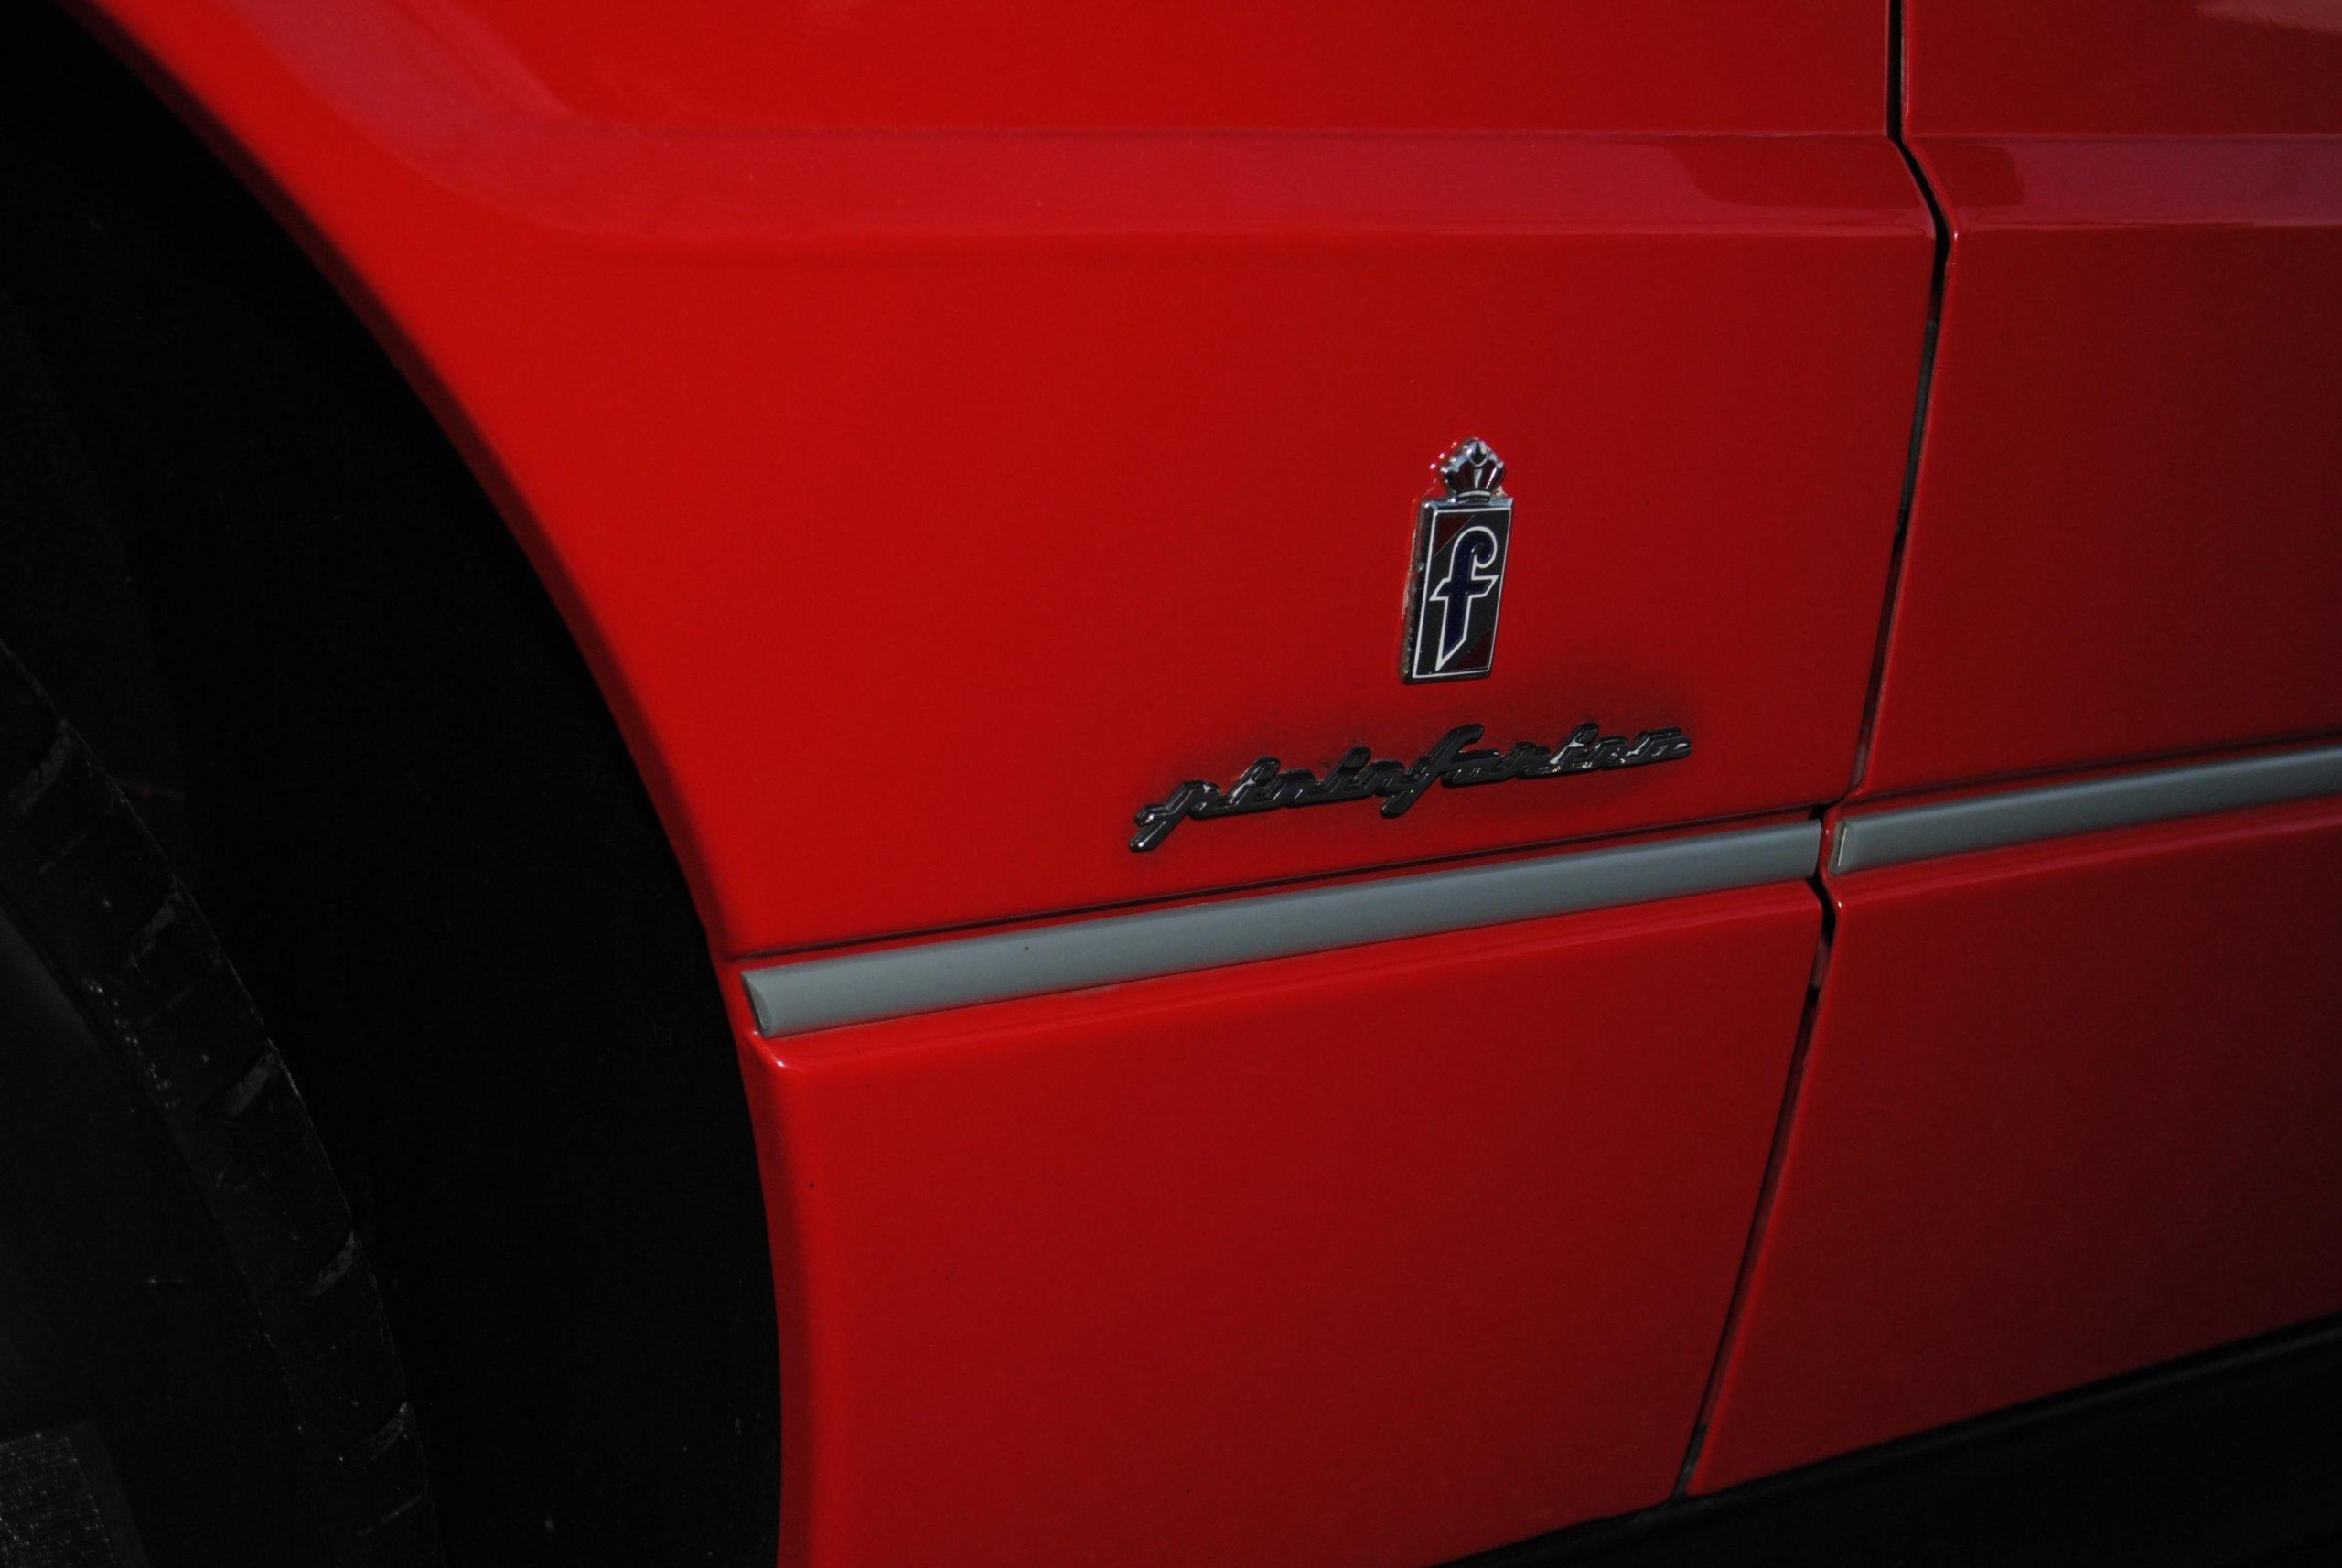 1993 Cadillac Allante pininfarina badge